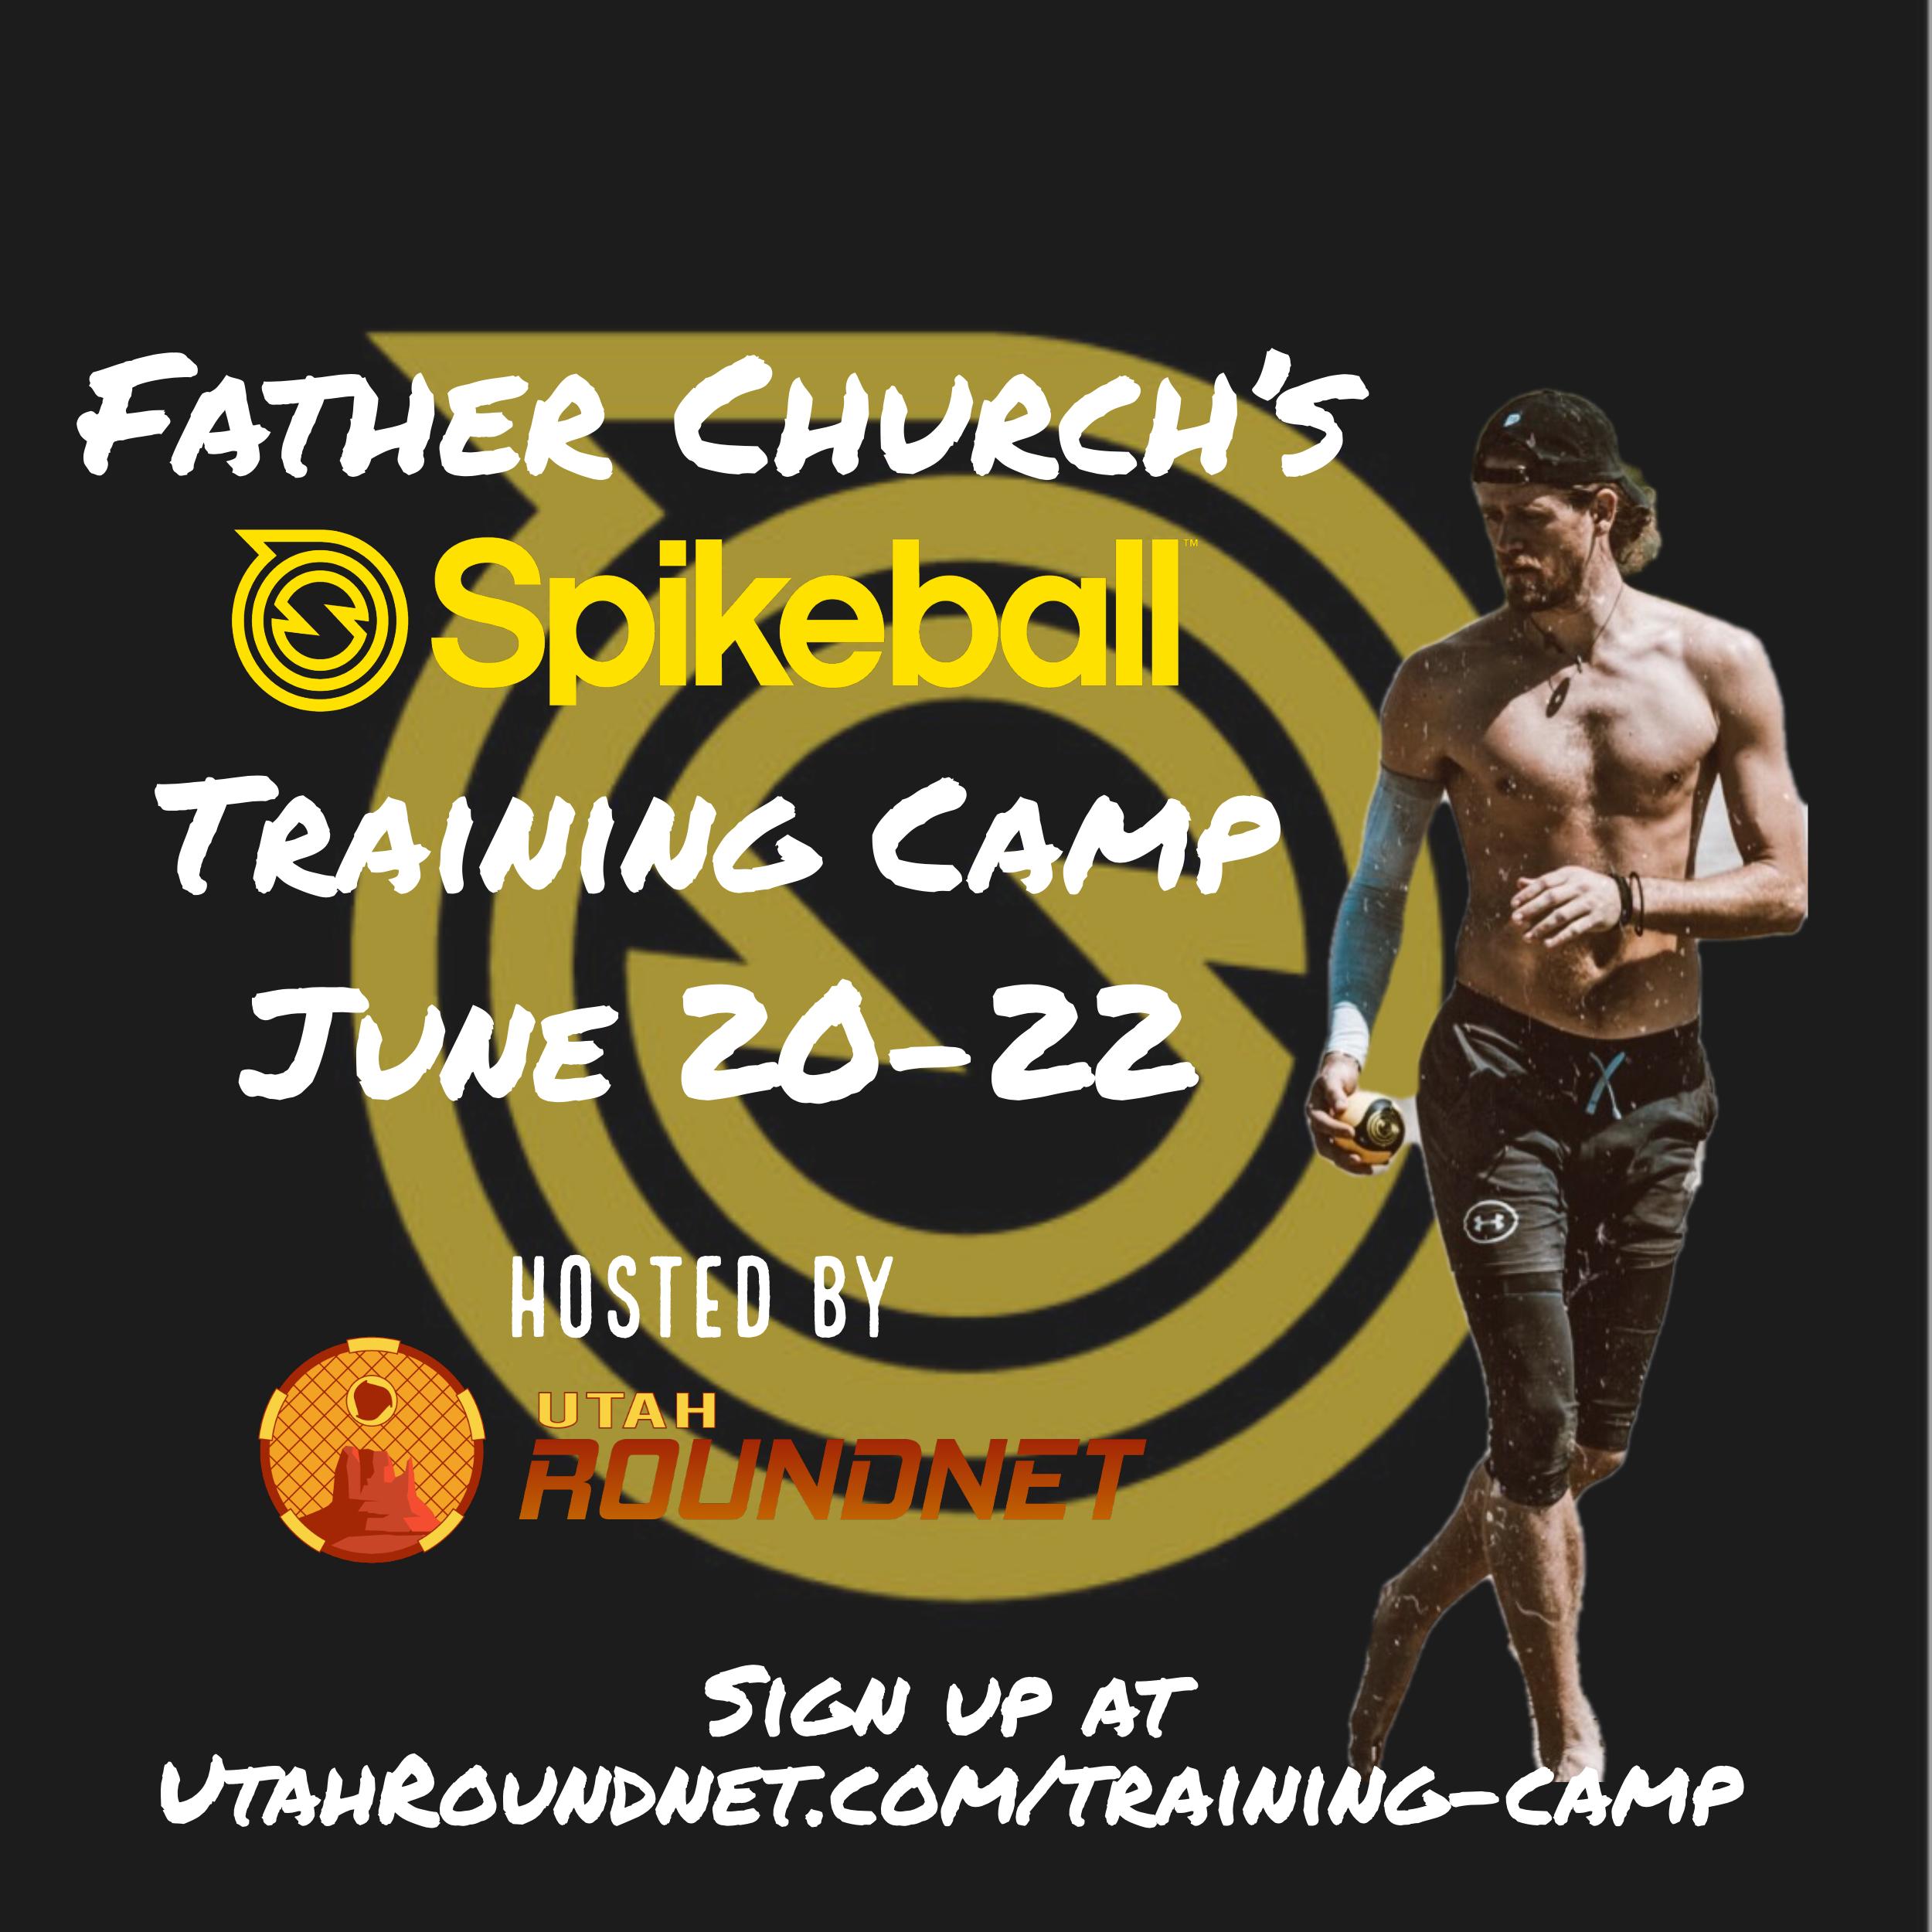 church-spikeball-training-camp.png